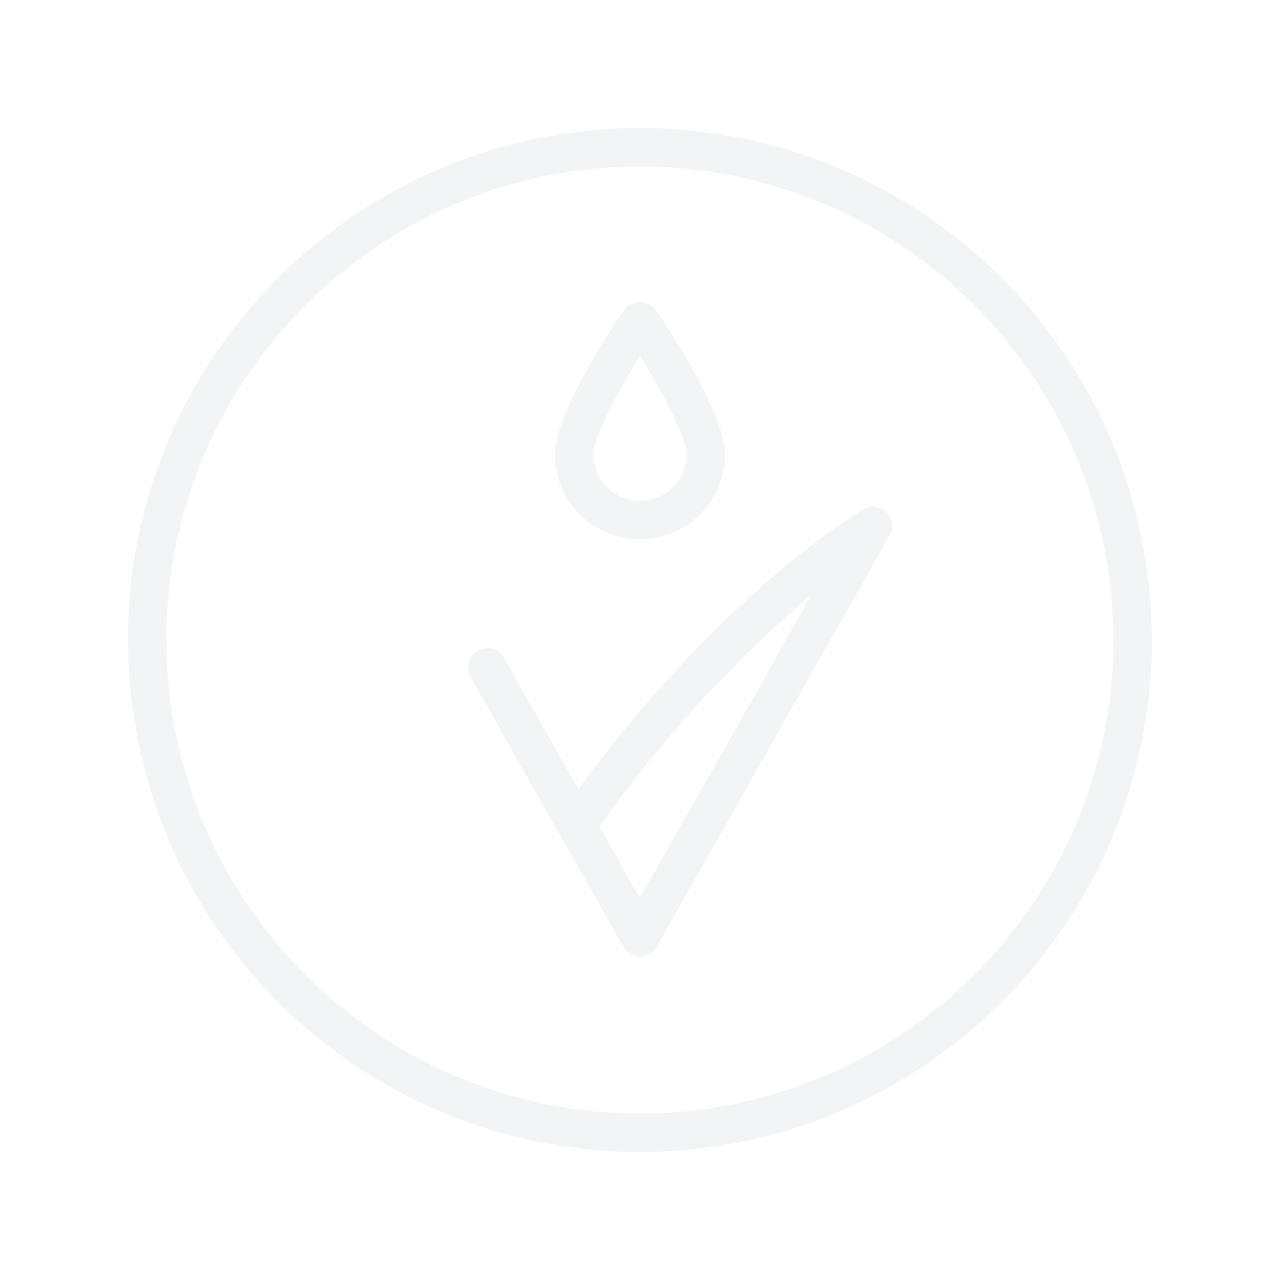 BOURJOIS Sourcil Precision Eyebrow Pencil 1.13g